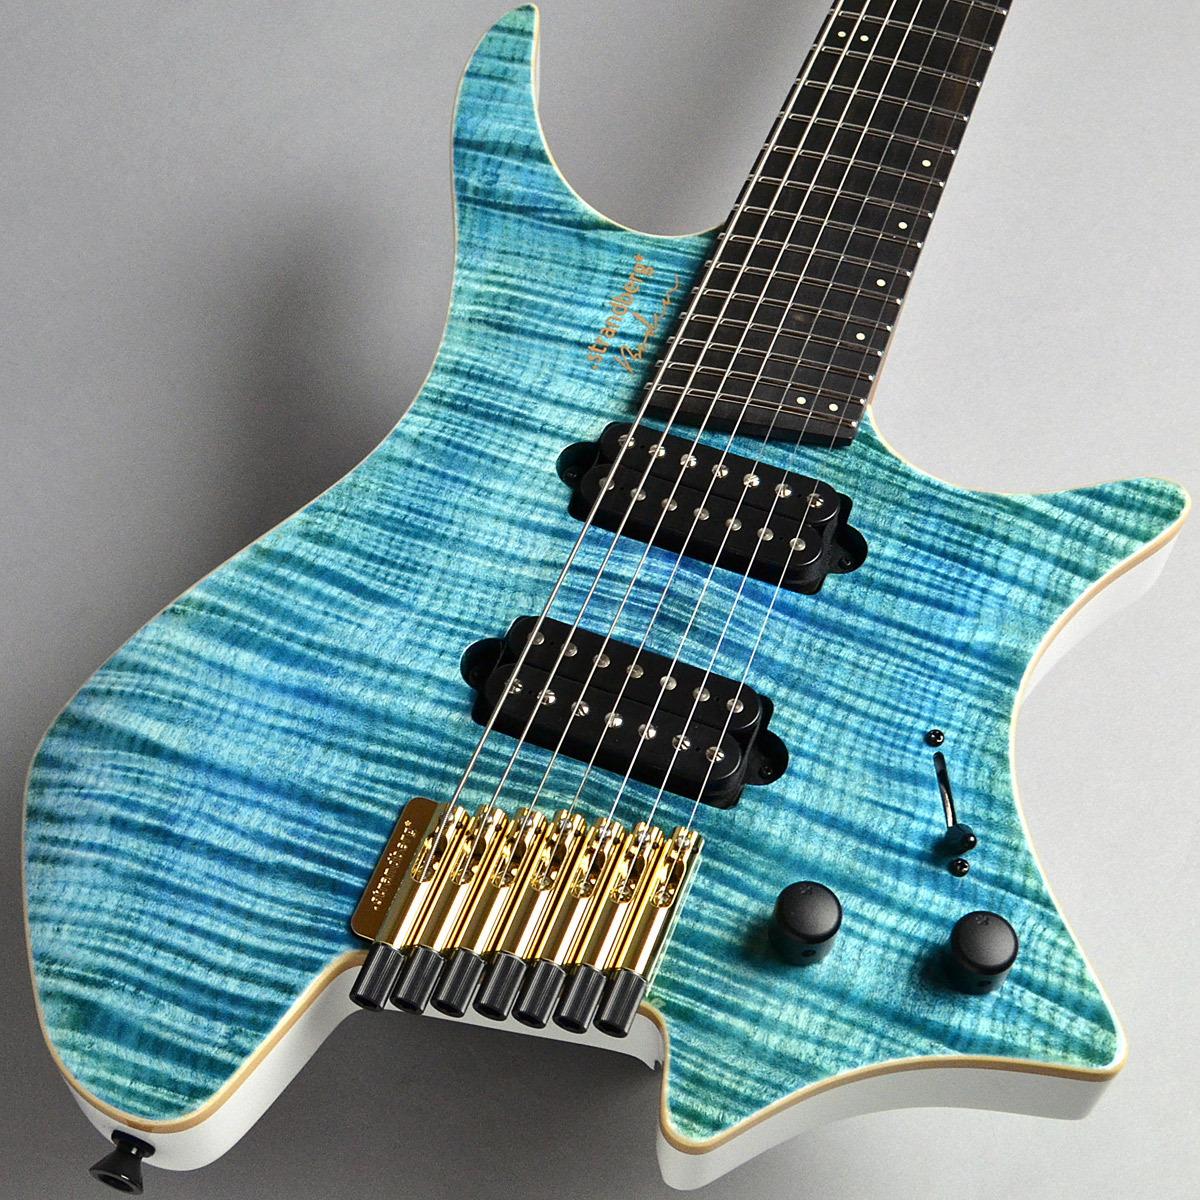 Strandberg Boden J7 Standard Flame Maple/Ebony Blue エレキギター(7弦) 【ストランドバーグ】【新宿PePe店】